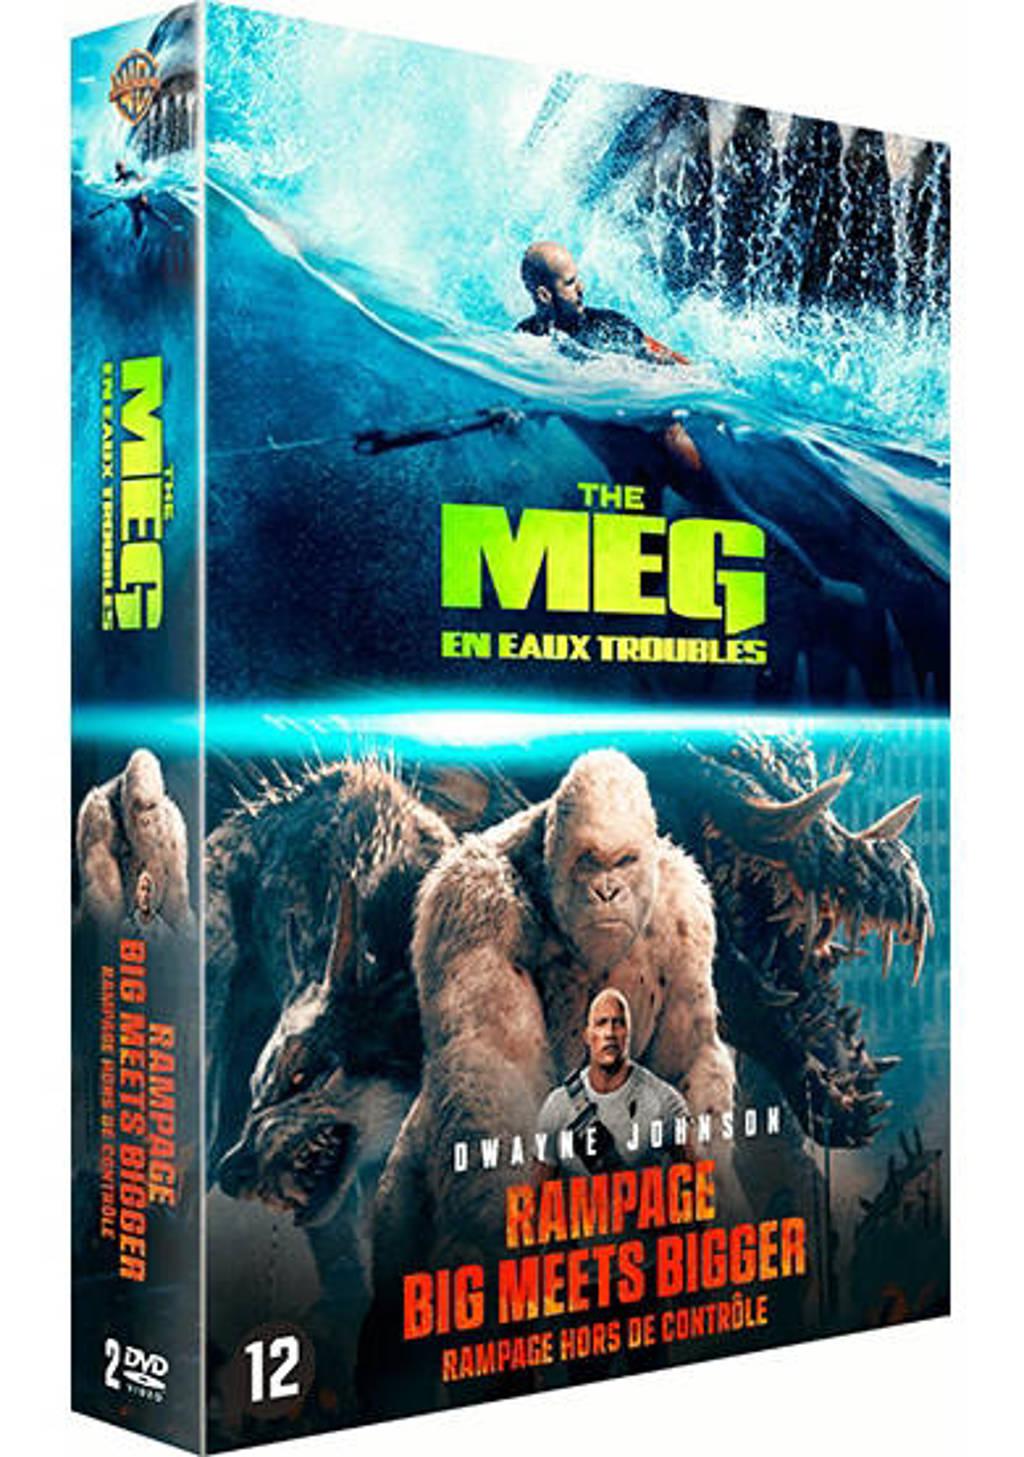 The meg + Rampage - Big meets bigger (DVD)